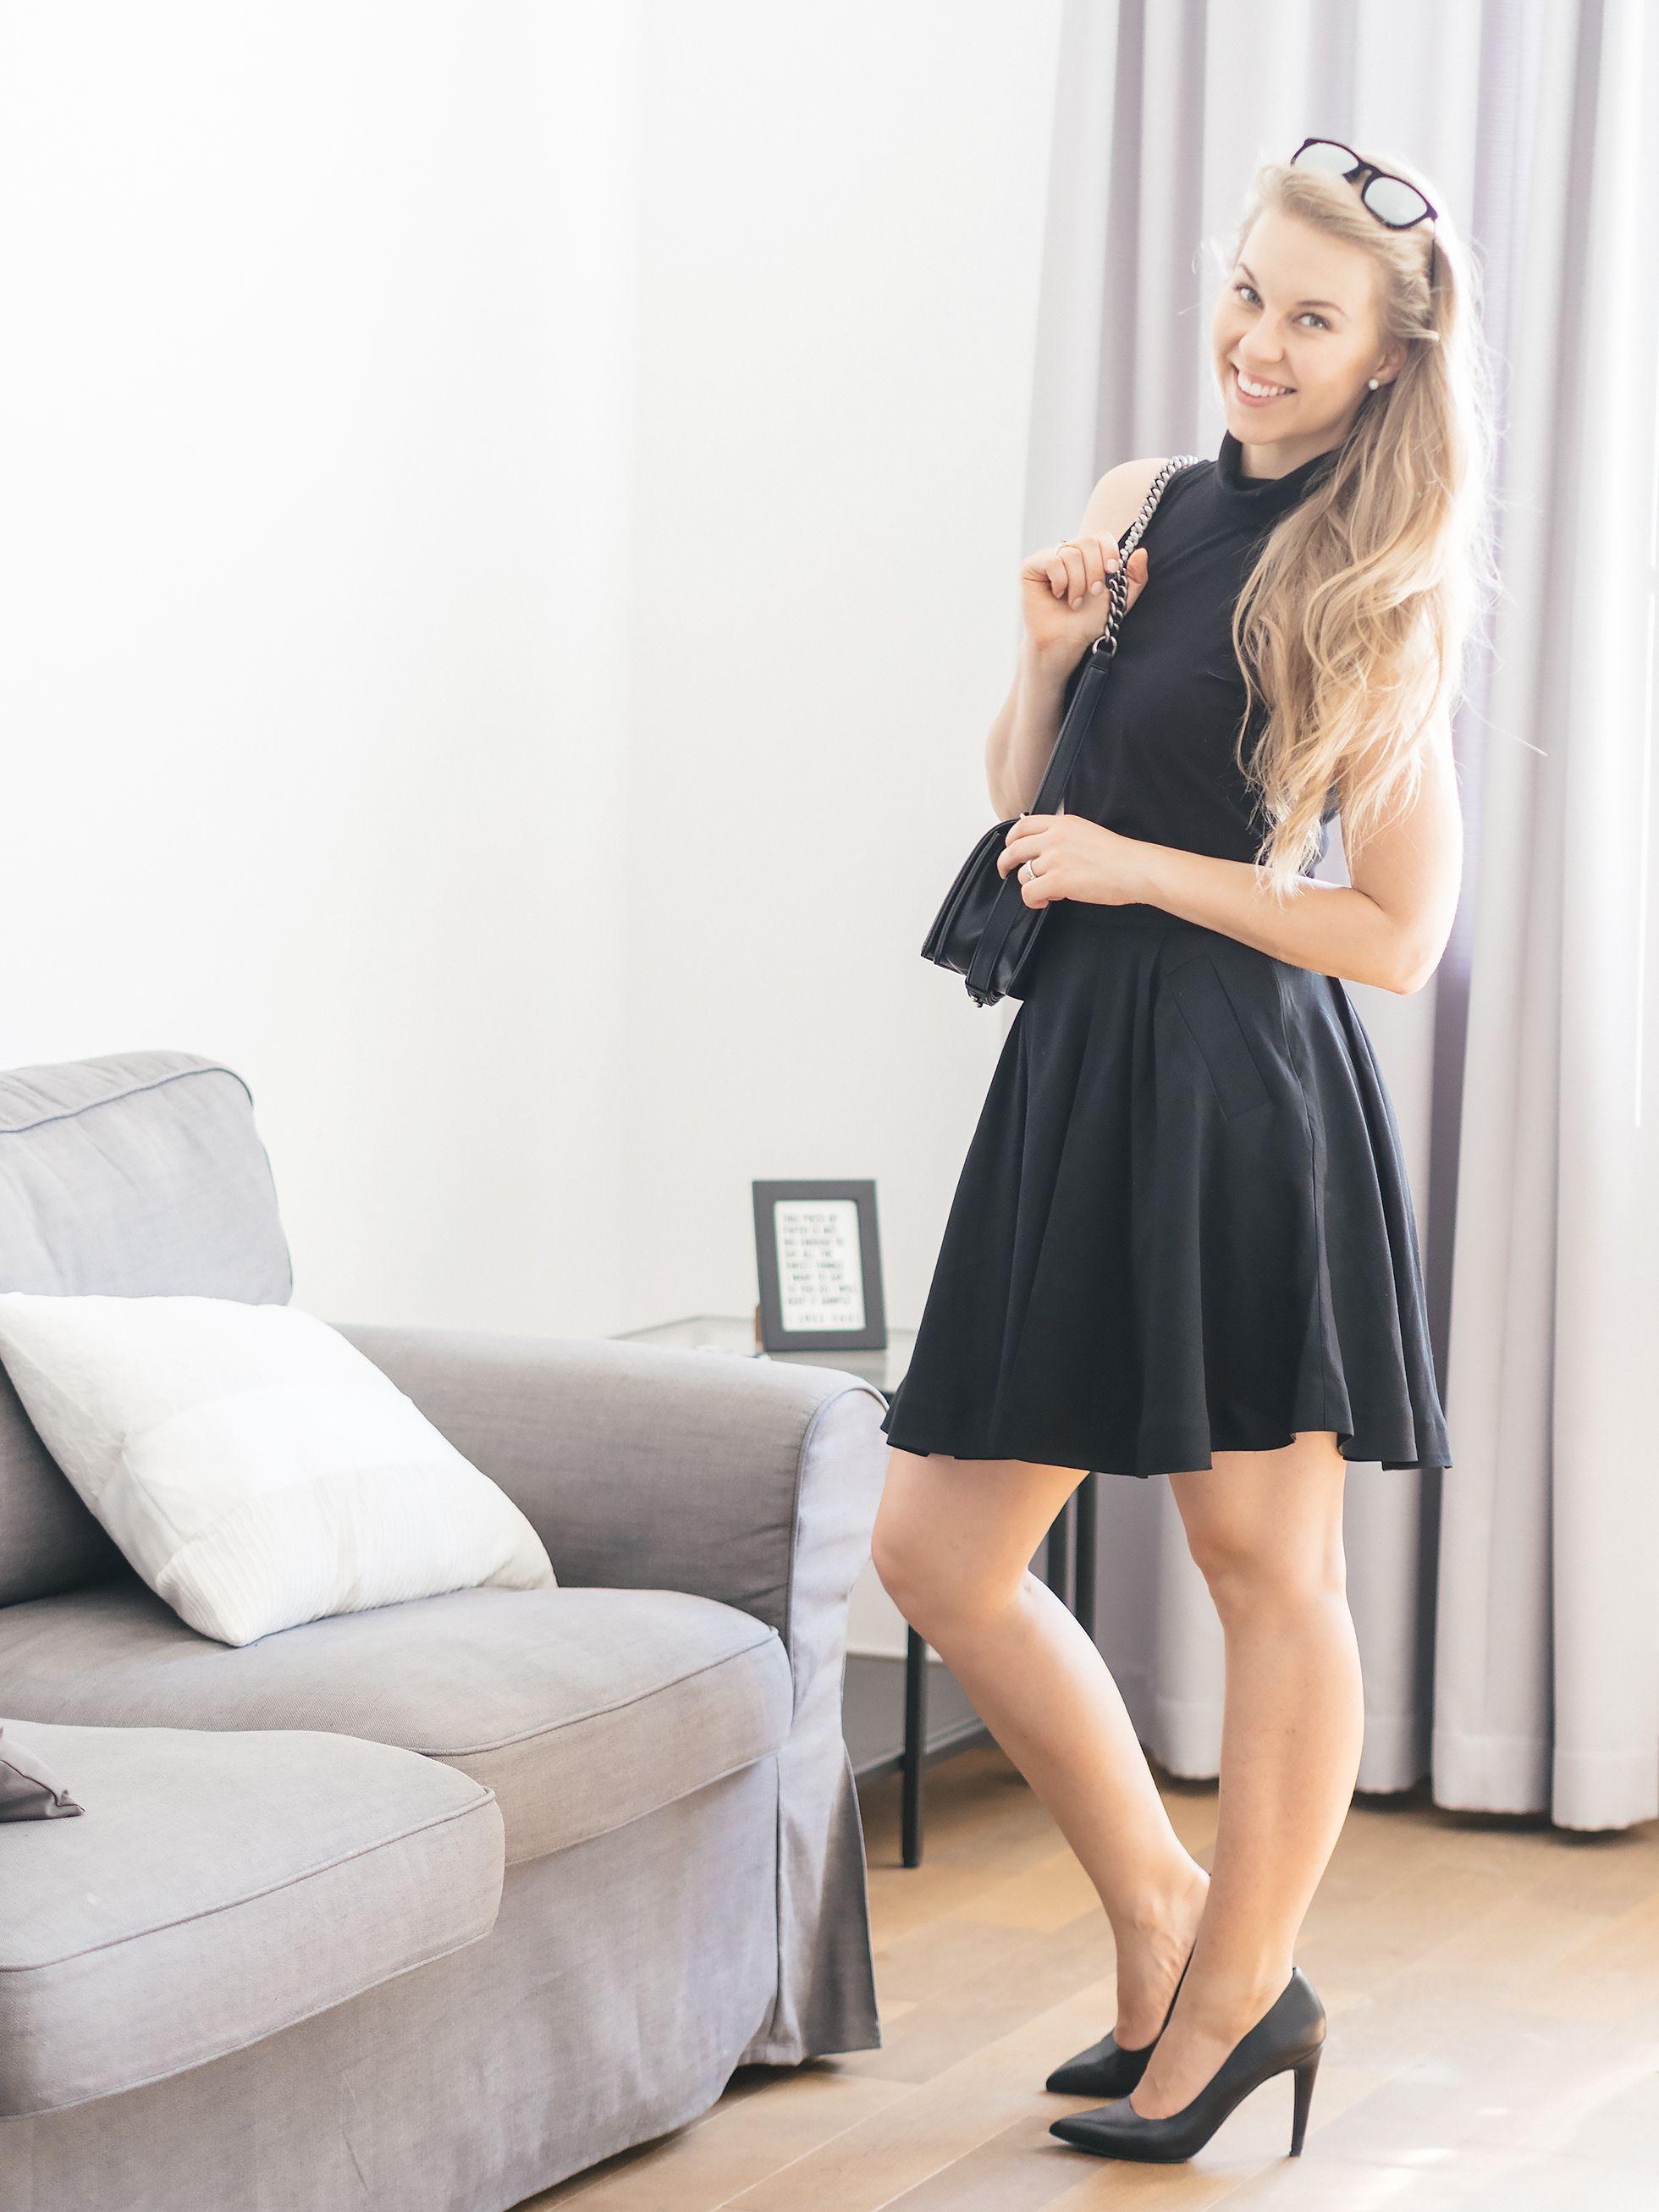 All Black, WHYRED black skirt http://www.monasdailystyle.com/2016/09/01/all-black-2/